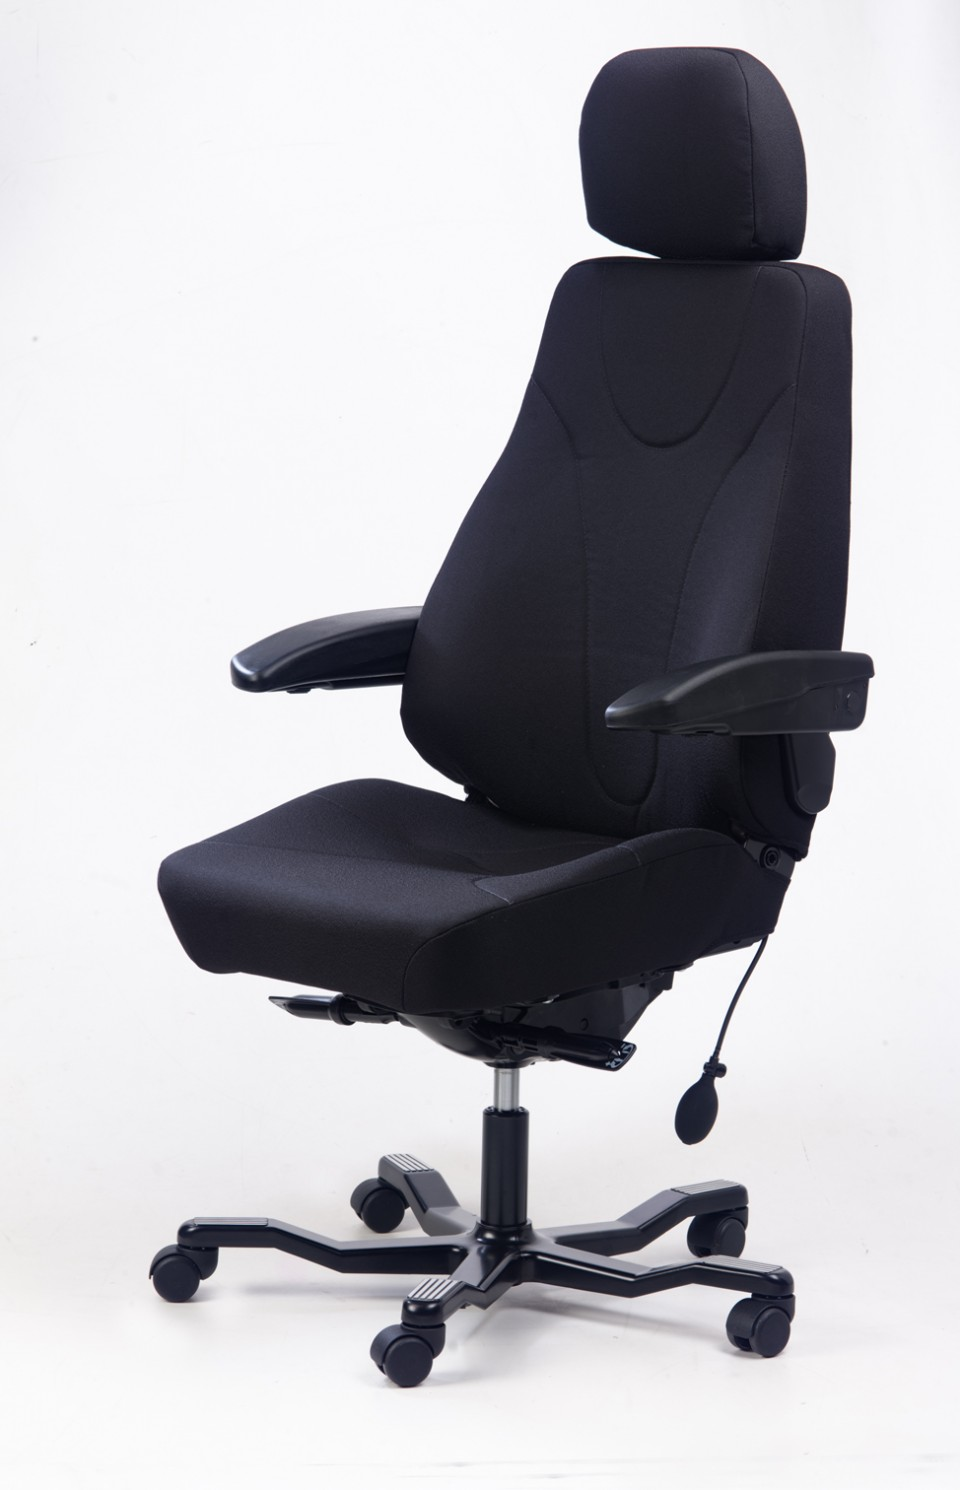 tabouret de bureau ergonomique simple pictures of. Black Bedroom Furniture Sets. Home Design Ideas